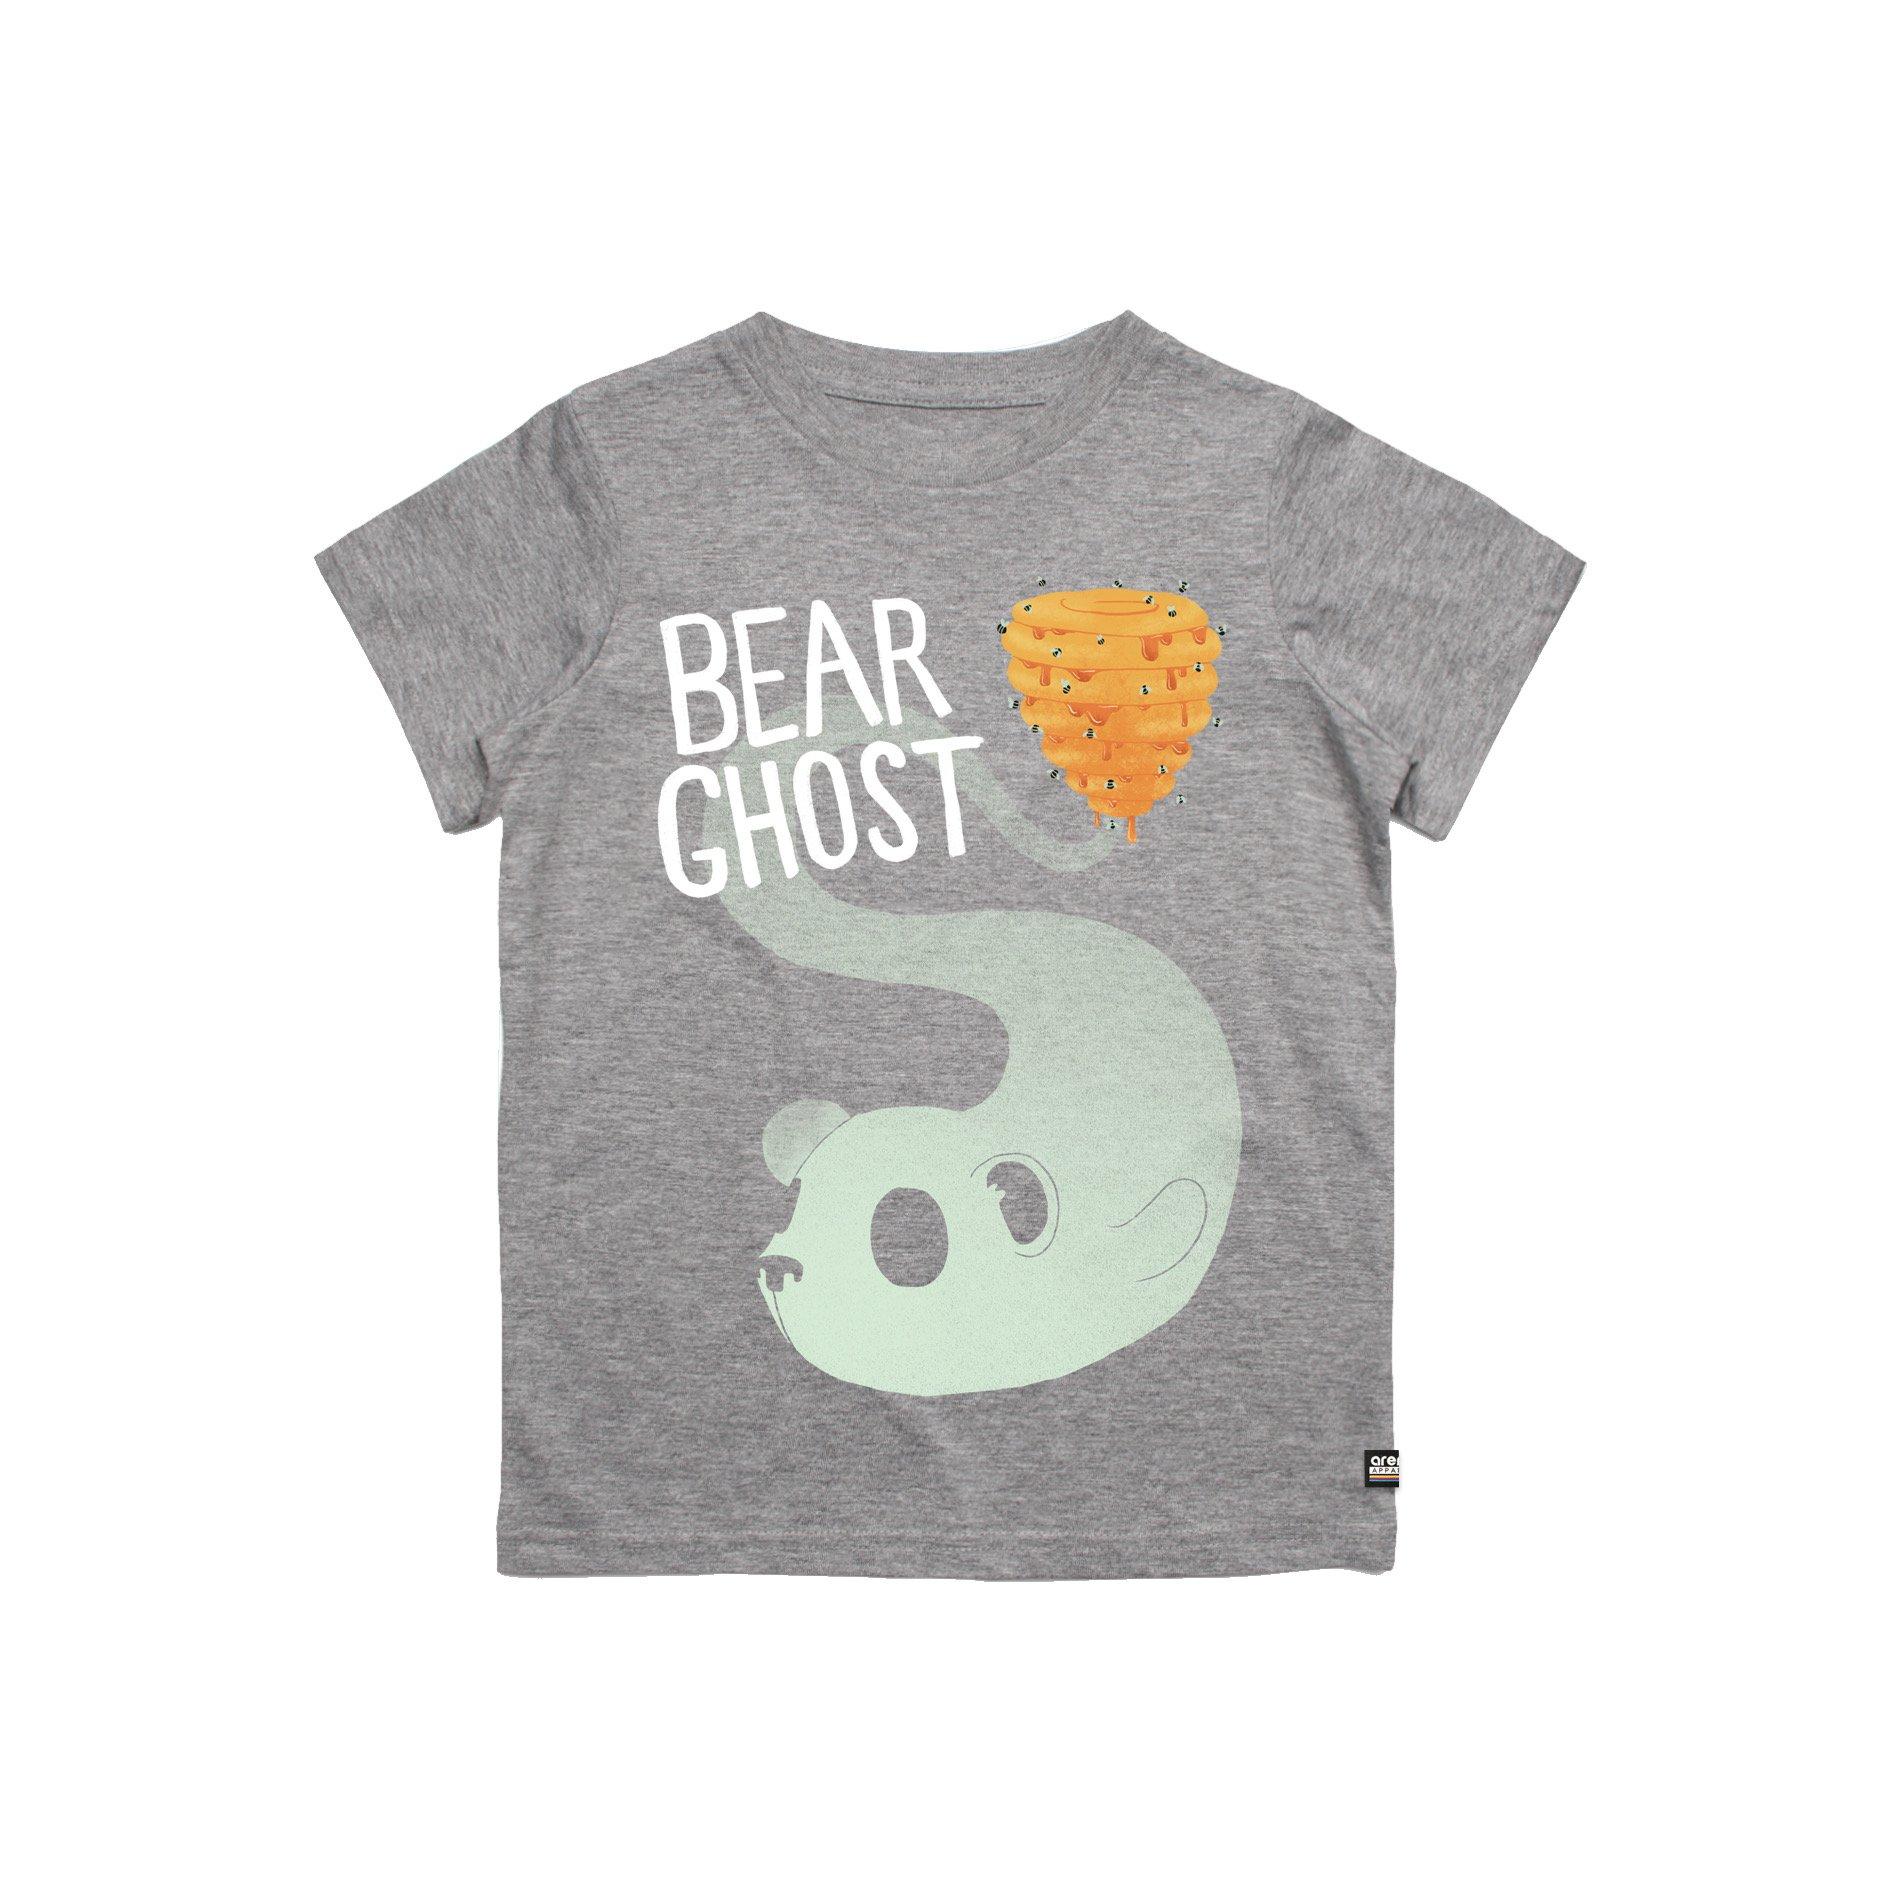 Bear Ghost - Hive Youth Tee Shirt   Bear Ghost